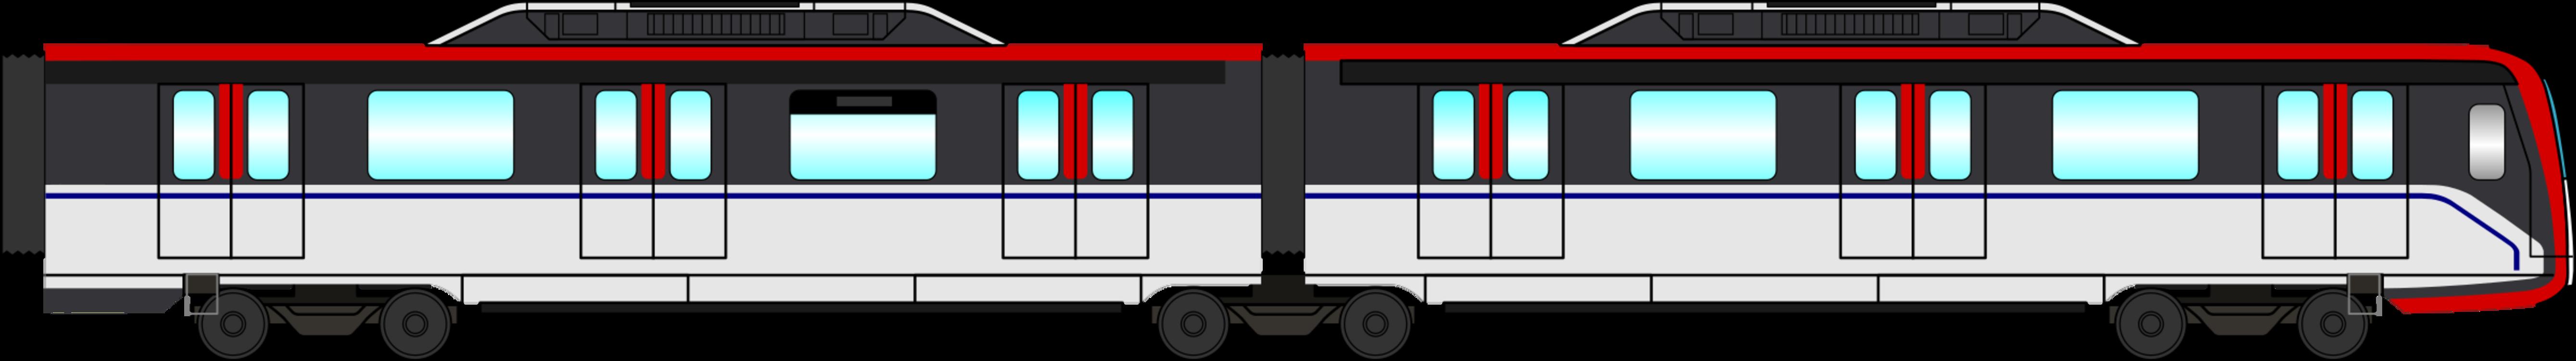 Rolling Stock,Public Transport,Train